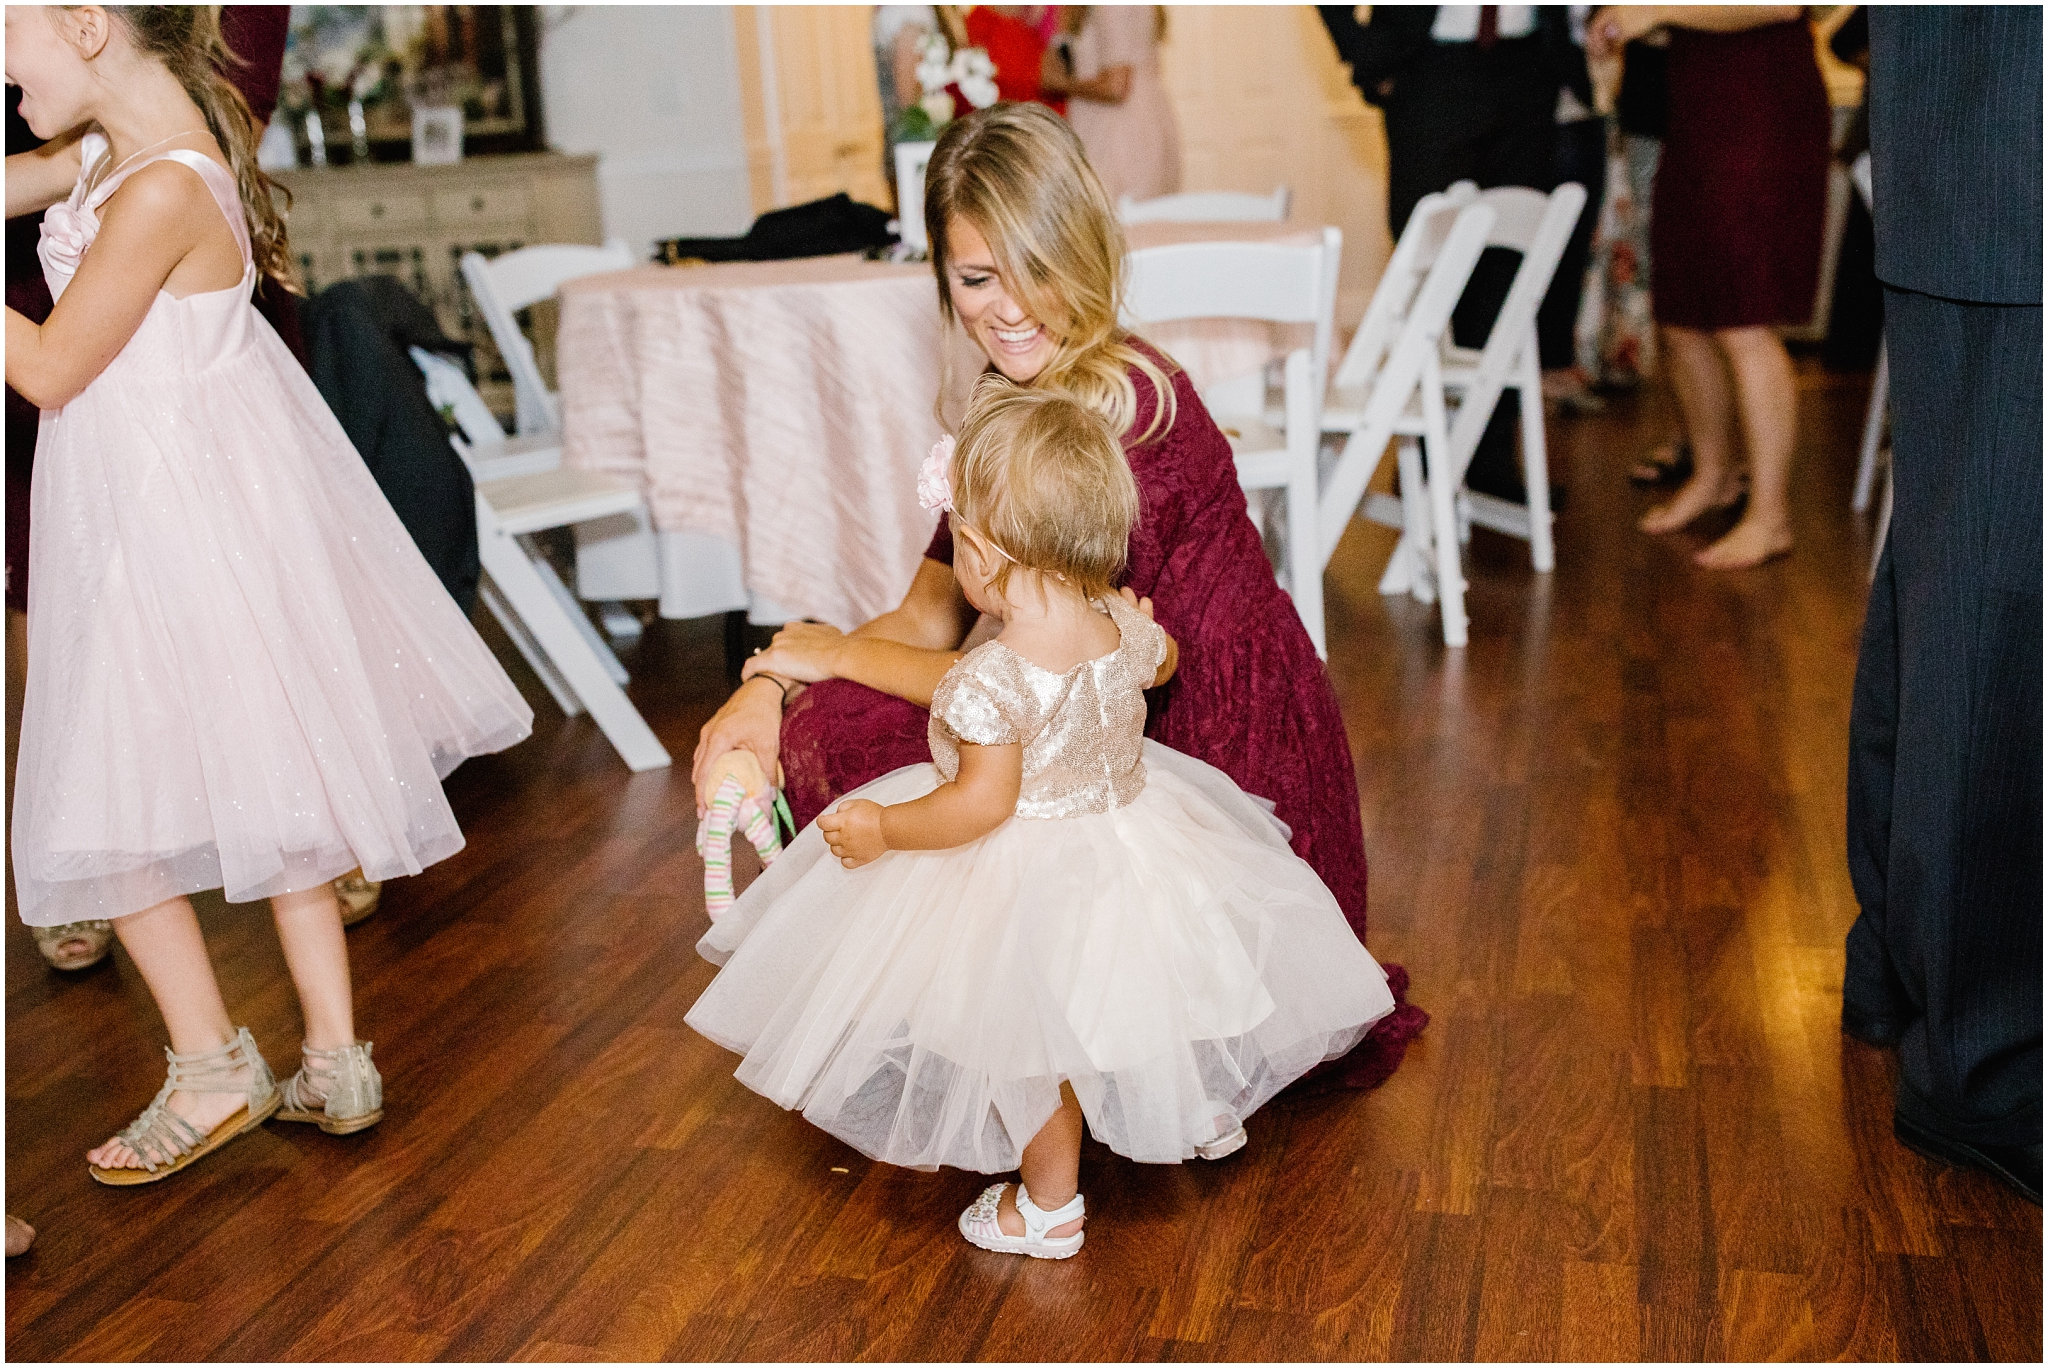 HannahChaseWedding-531_Lizzie-B-Imagery-Utah-Wedding-Photographer-Park-City-Salt-Lake-City-Payson-Temple-Clarion-Garden-Center.jpg